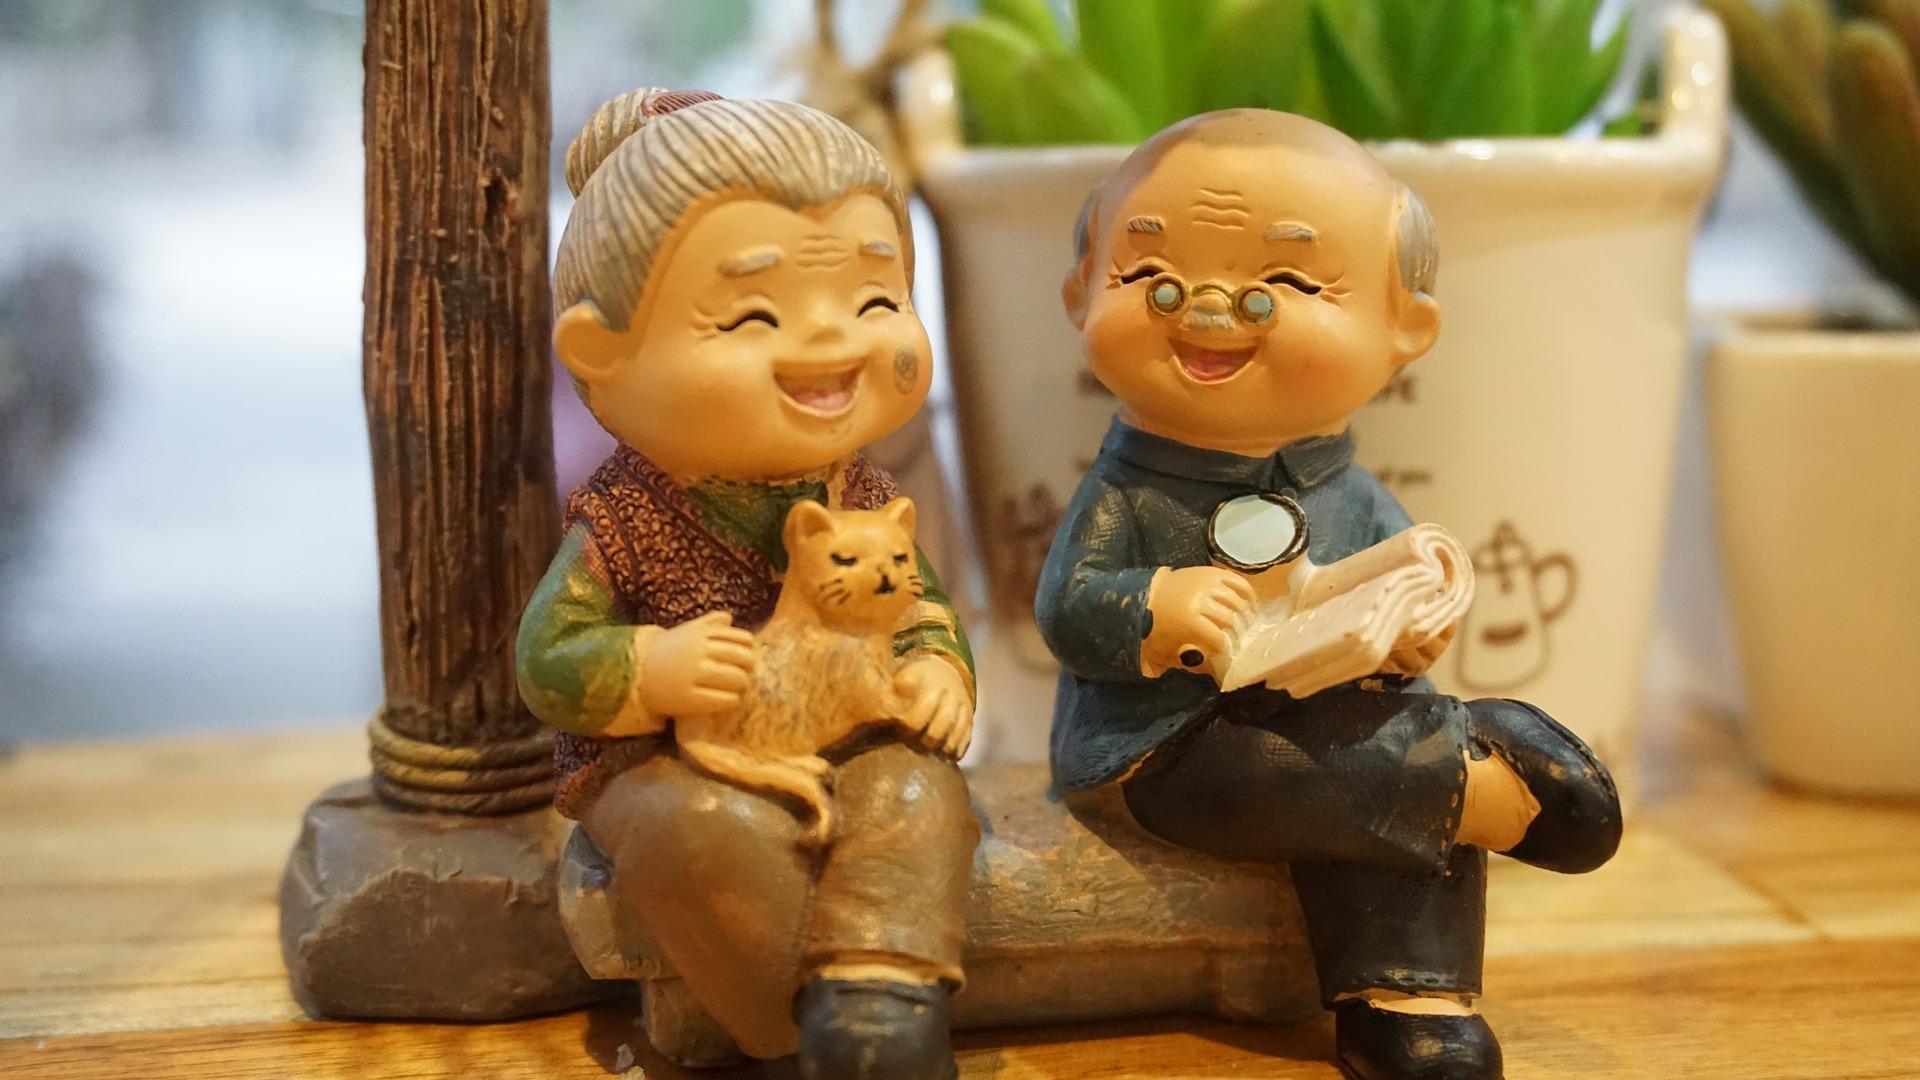 grandparents-3436463_1920.jpg